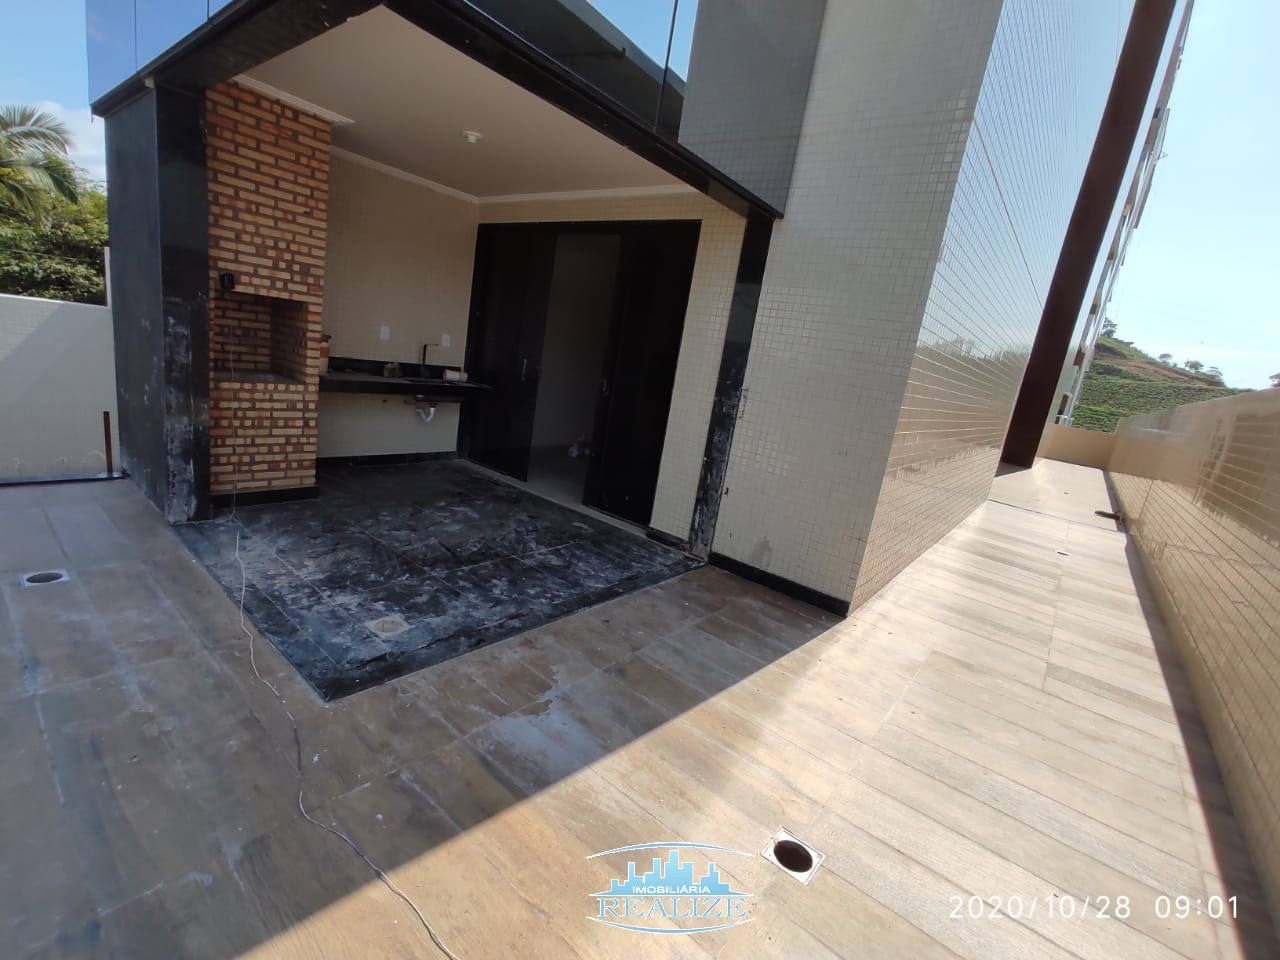 Vende Apartamento 290 m² de Área Privativa, Bairro Cidade Nobre